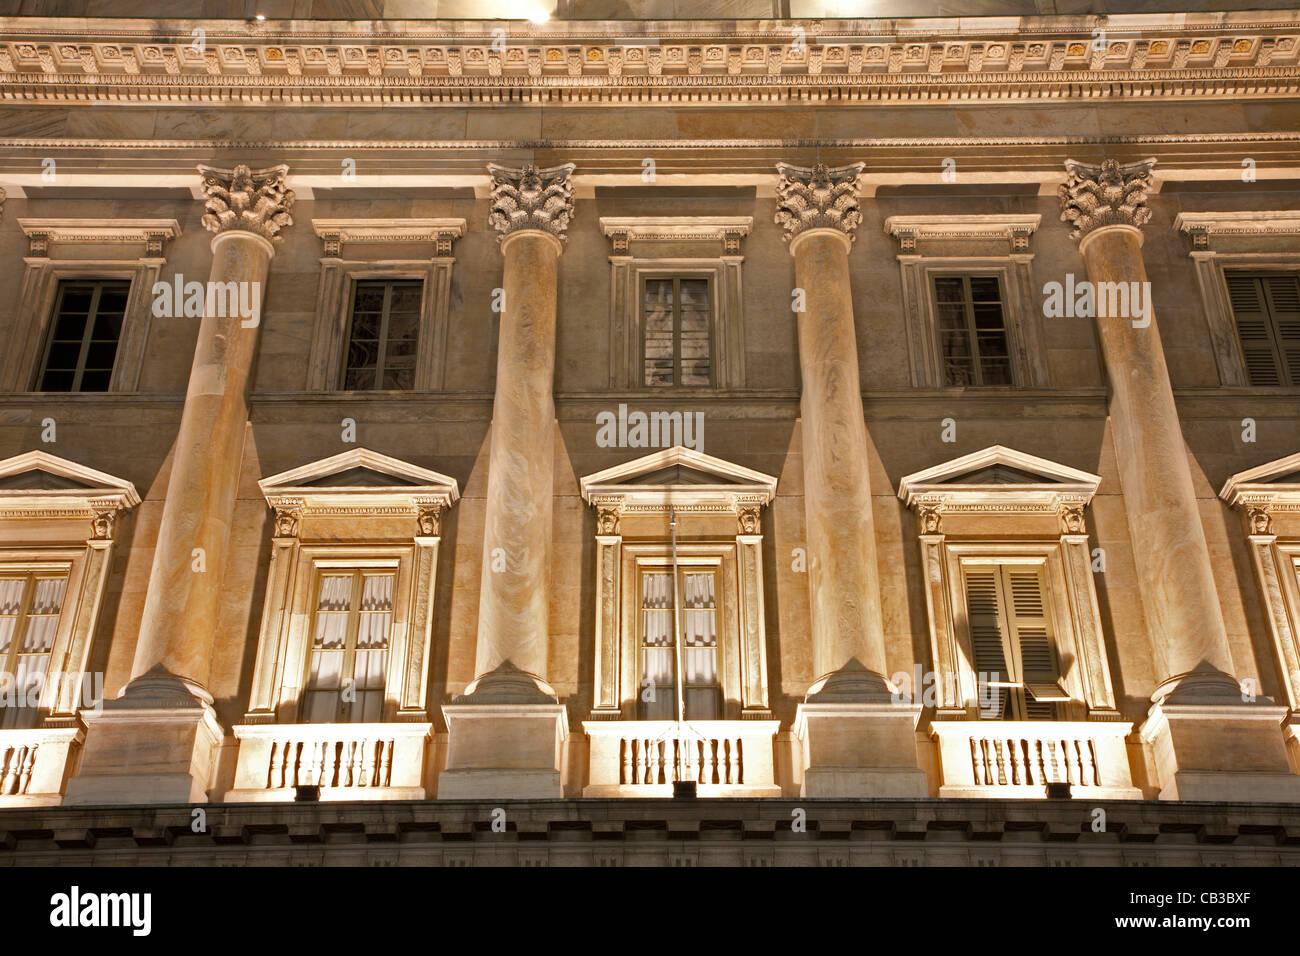 Milan - detail from palace facade at night - Stock Image